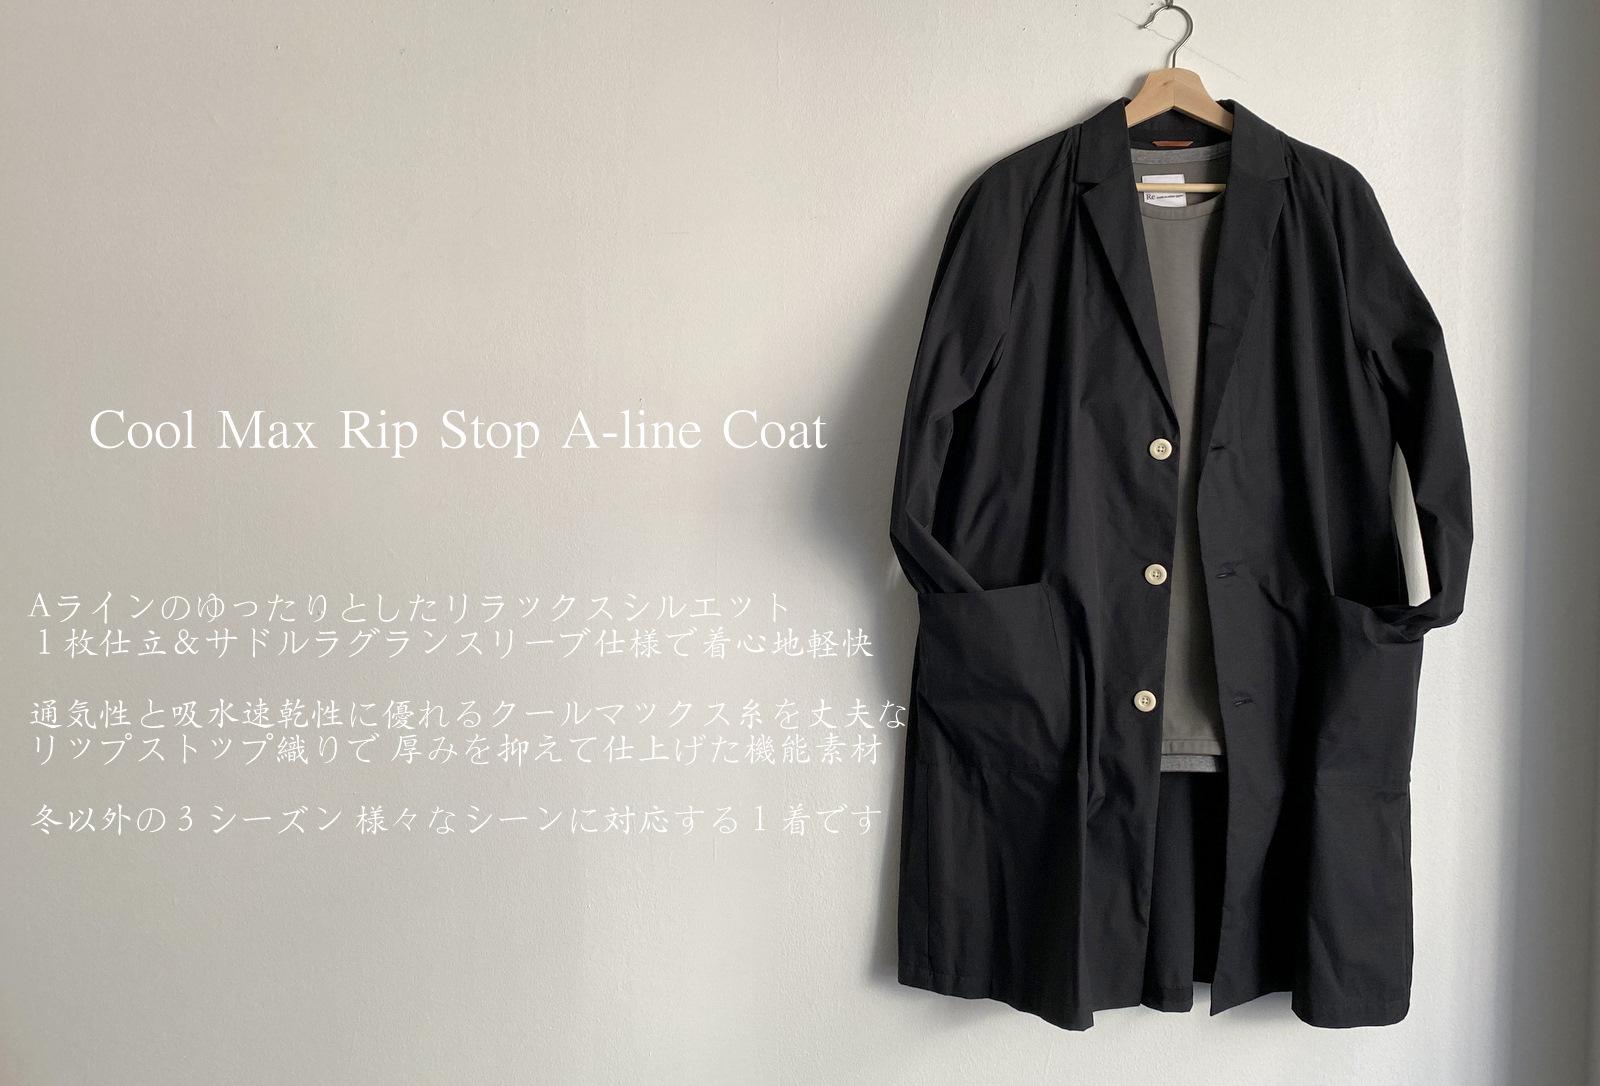 Cool Max Rip Stop A-line Coat_c0379477_19395285.jpg